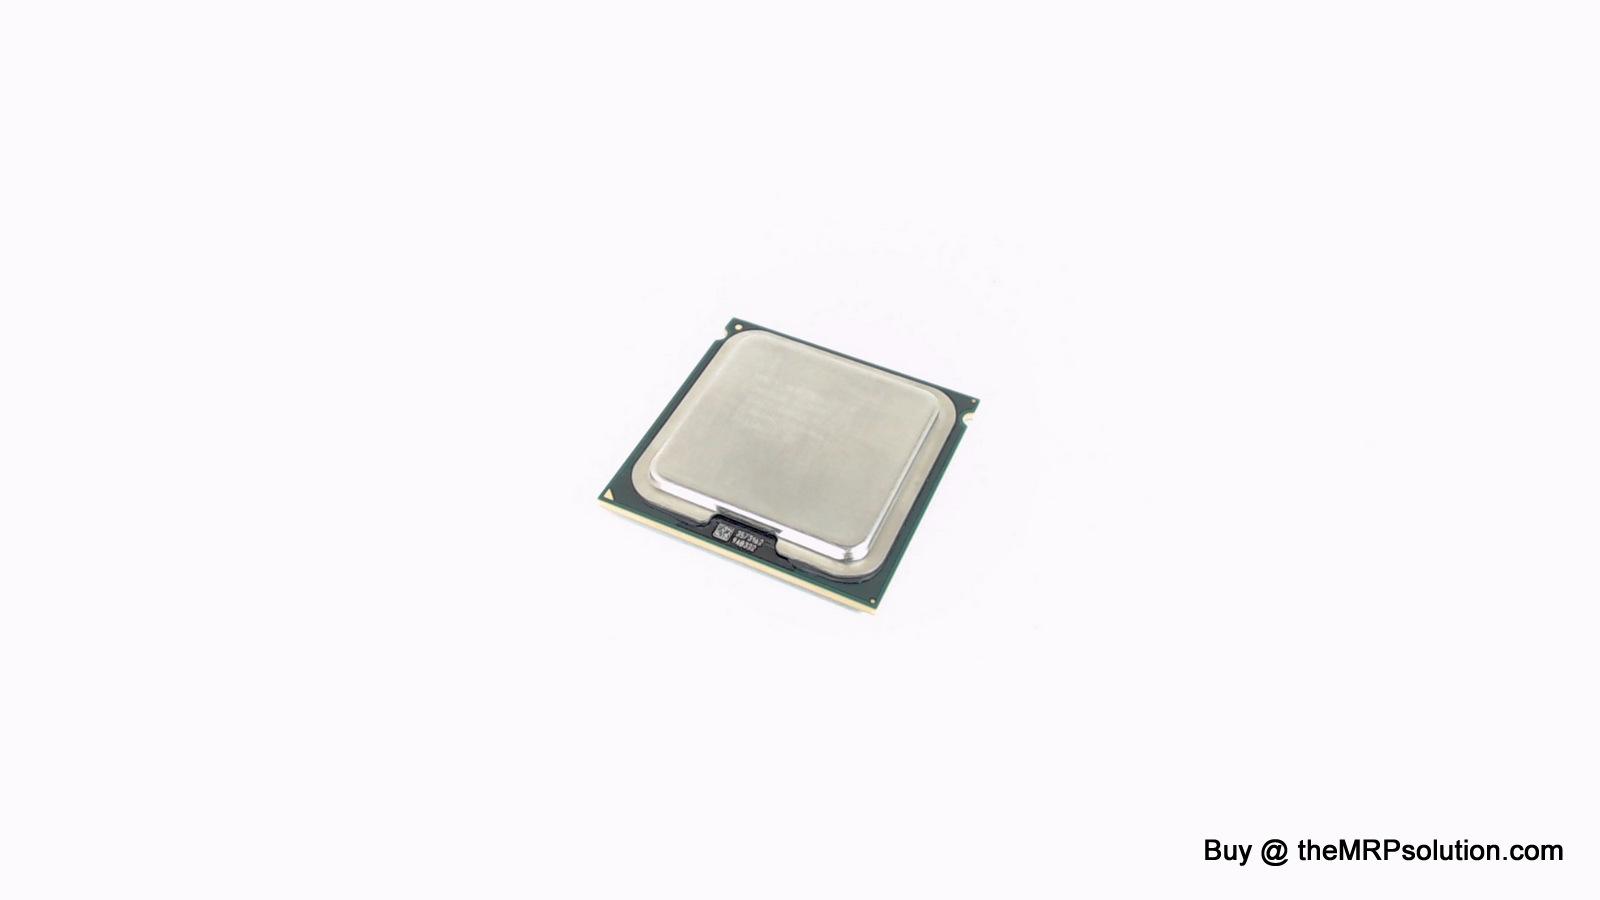 DELL NN045 1.86 GHZ 8M, 1066MH L5320 QUAD CORE Refurbished